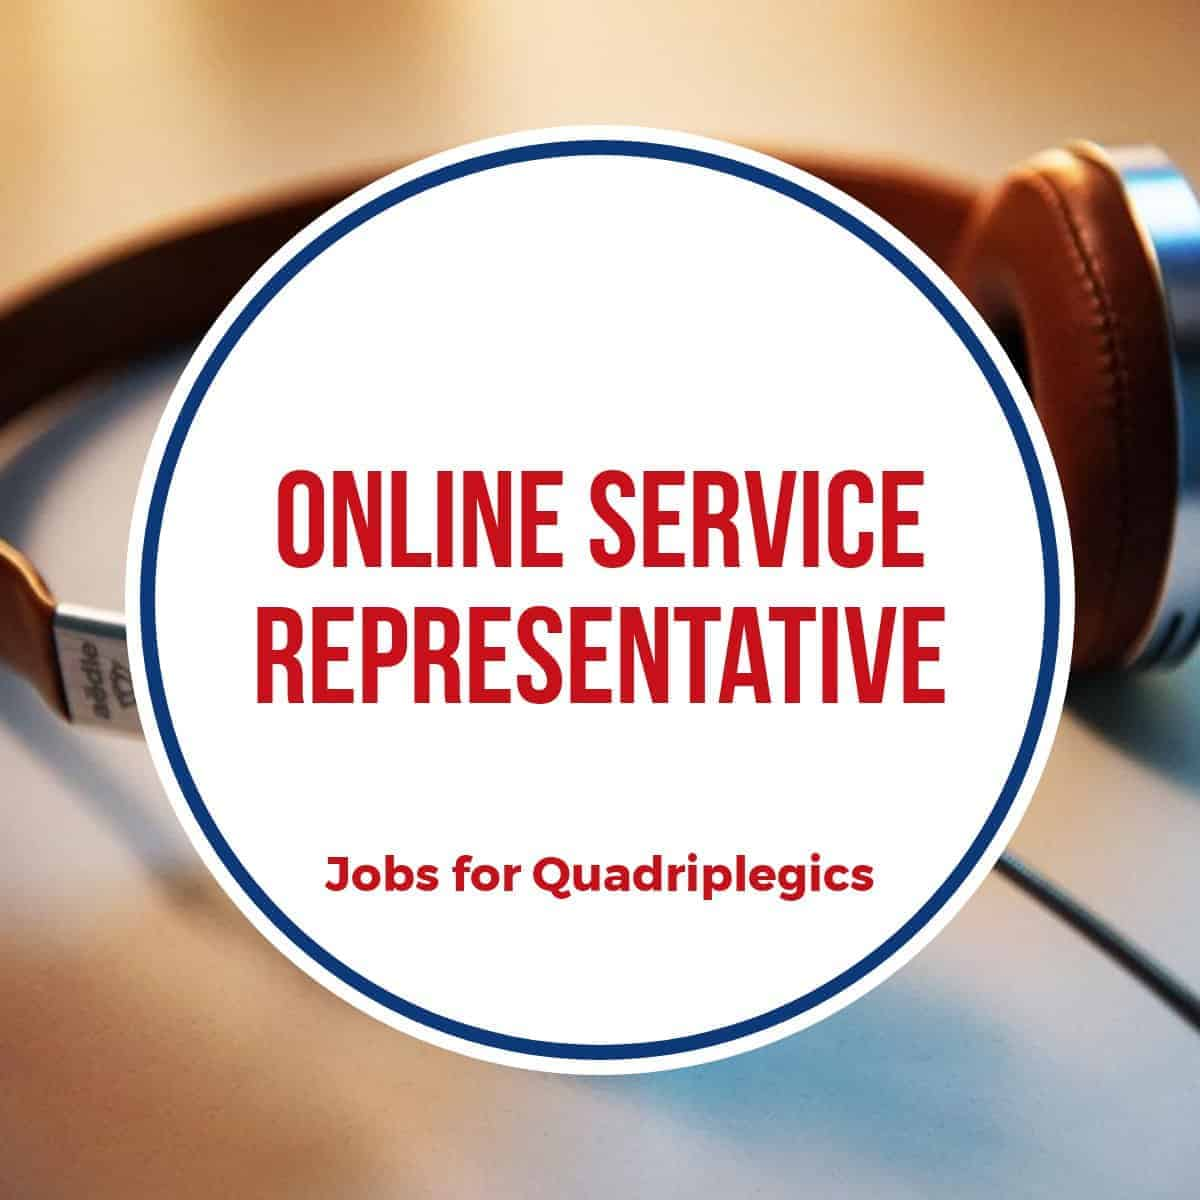 Online Service Representative